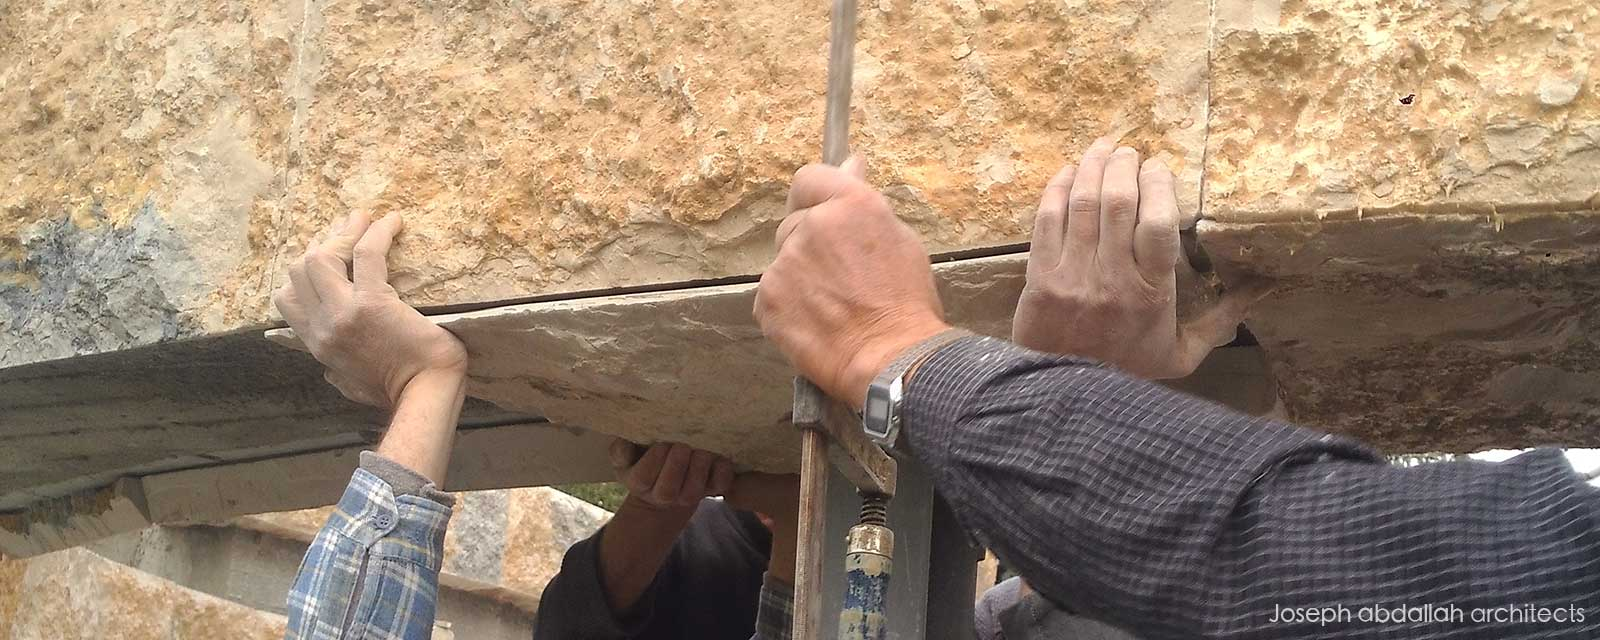 harissa-notre-dame-of-lebanon-shrink-architecture-joseph-abdallah-architects-7